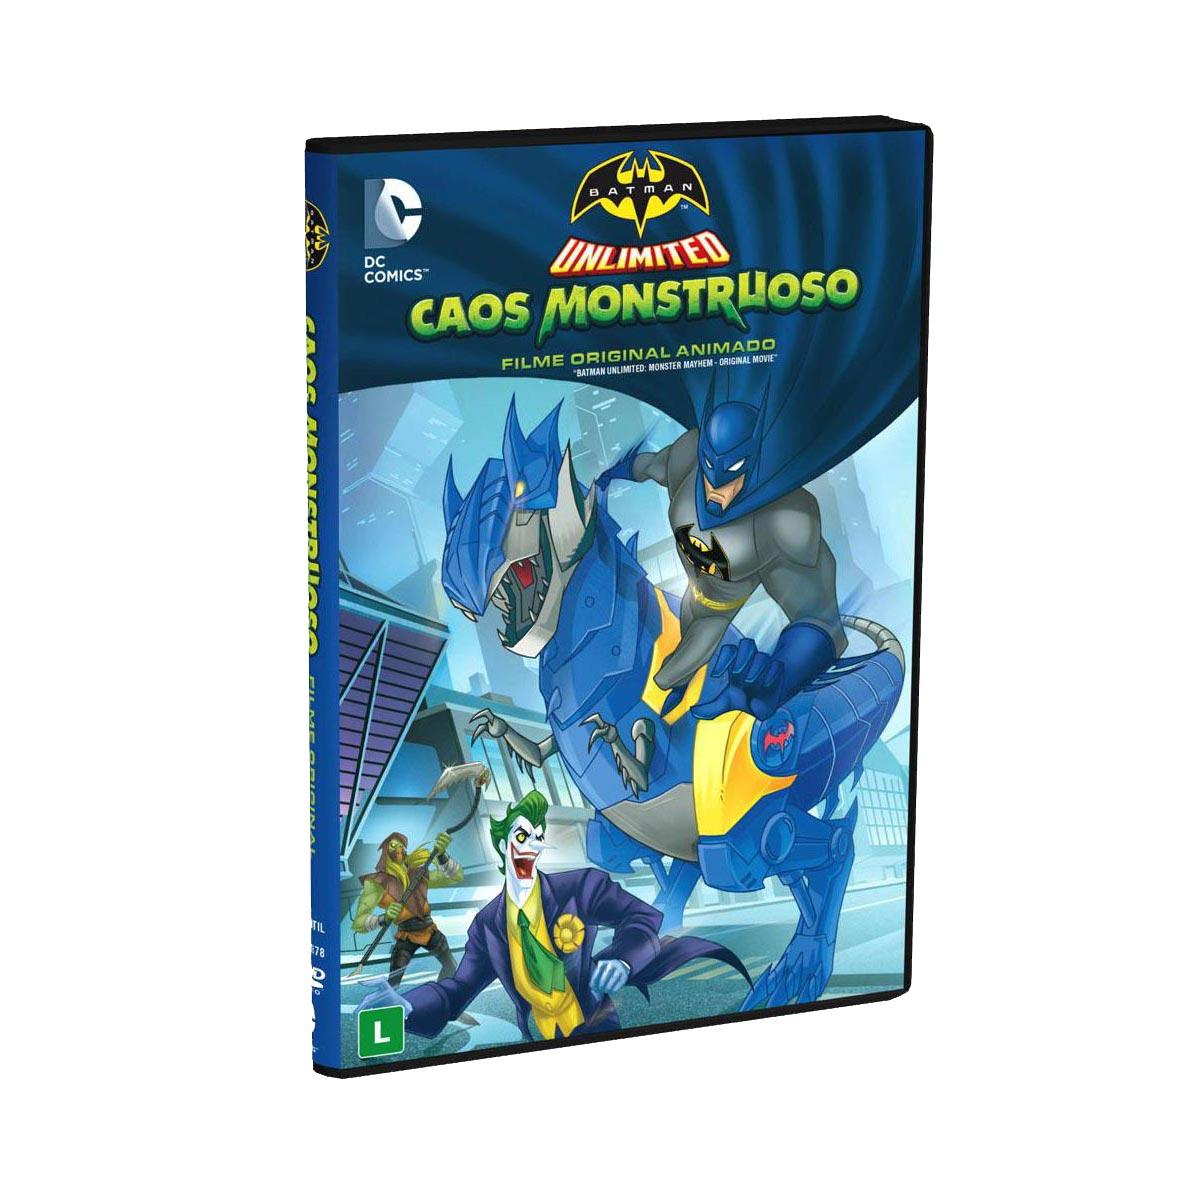 DVD Batman Unlimited Caos Monstruoso